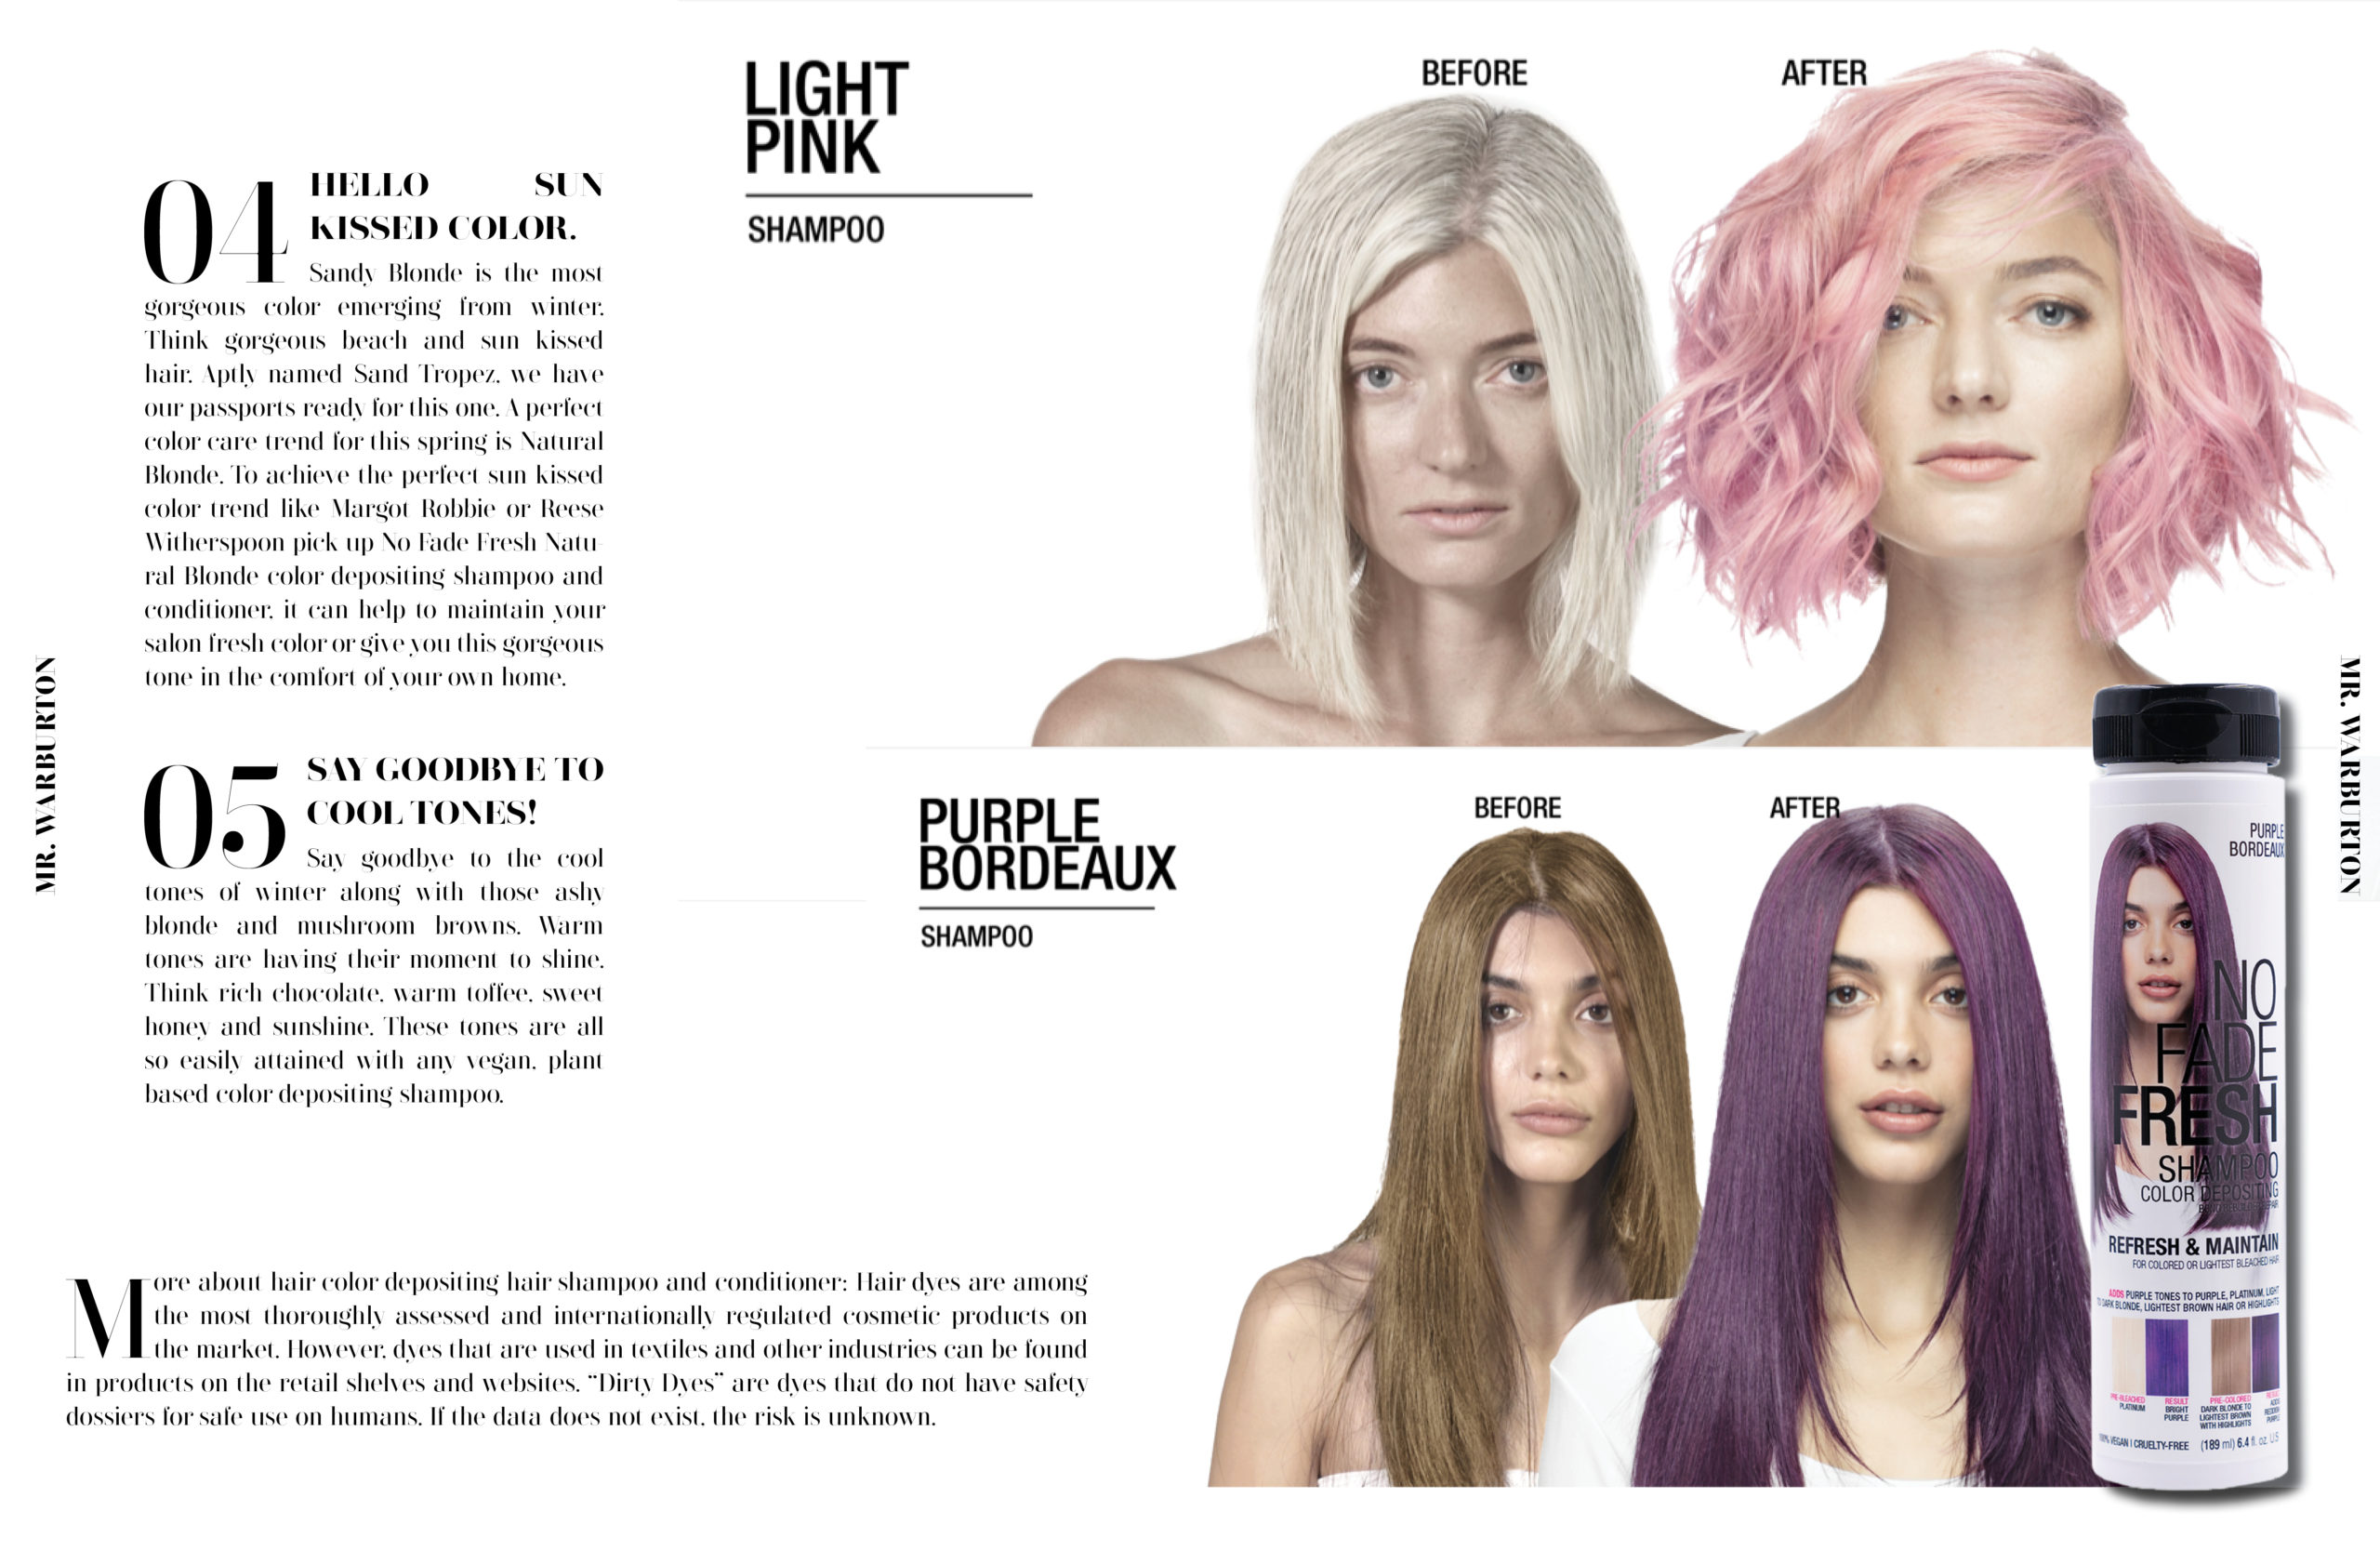 Mr. Warburton Magazine Clean Hair Color